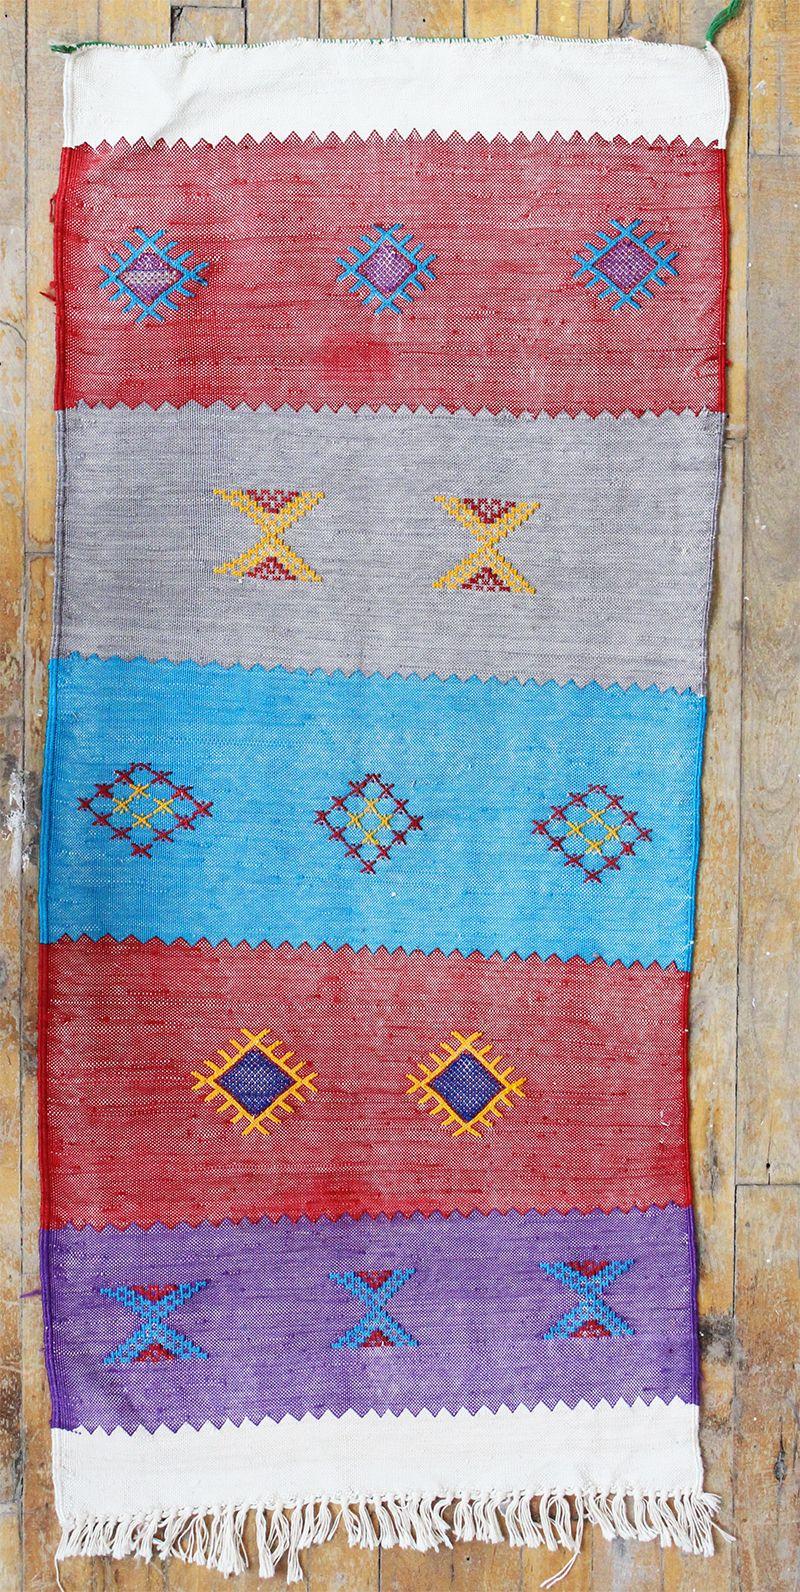 Colorful kilim carpet, Baba Souk